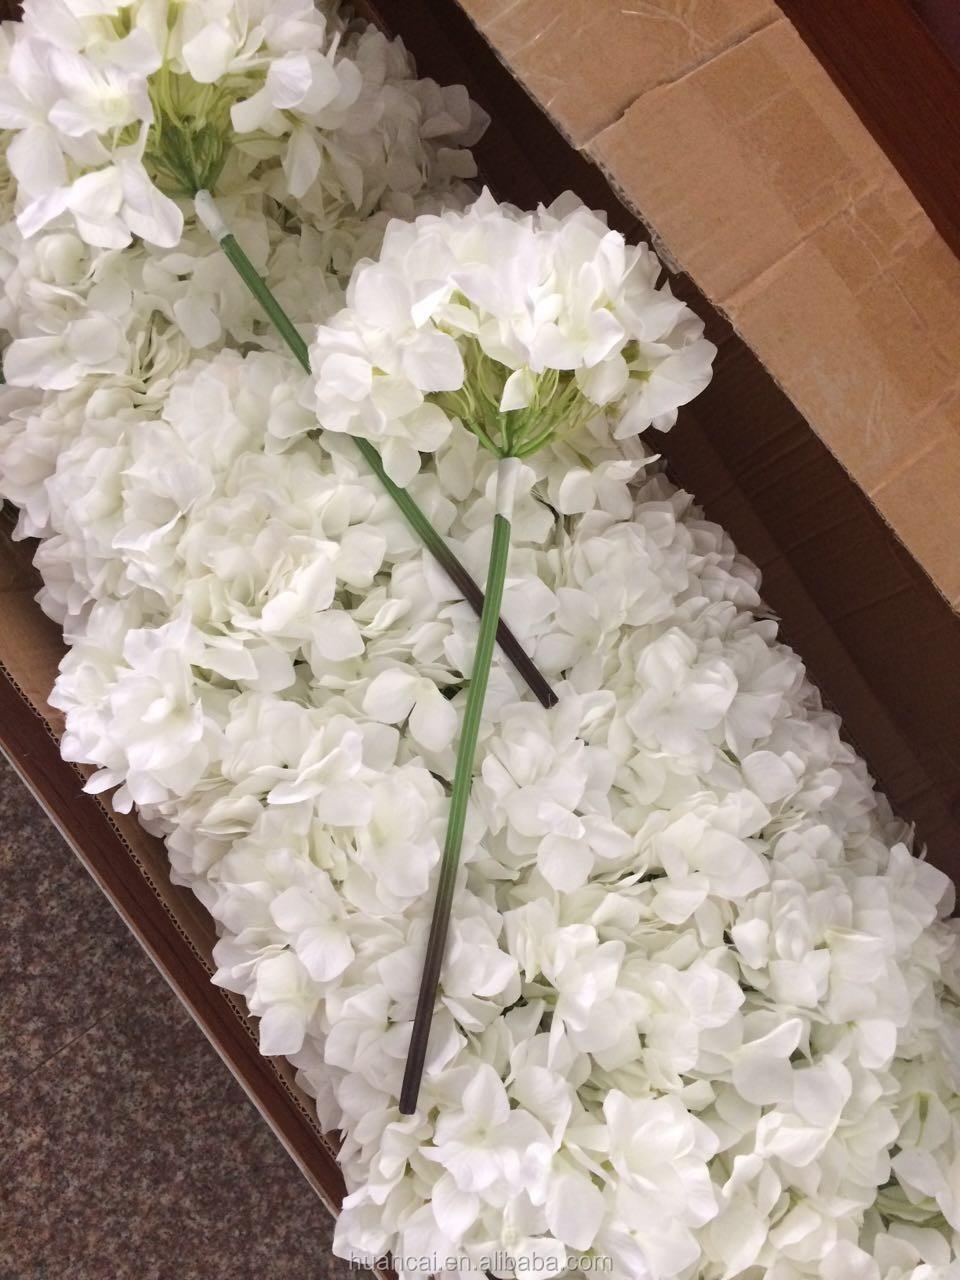 Blue And White Hydrangea Wholesale White Hydrangea Suppliers Alibaba